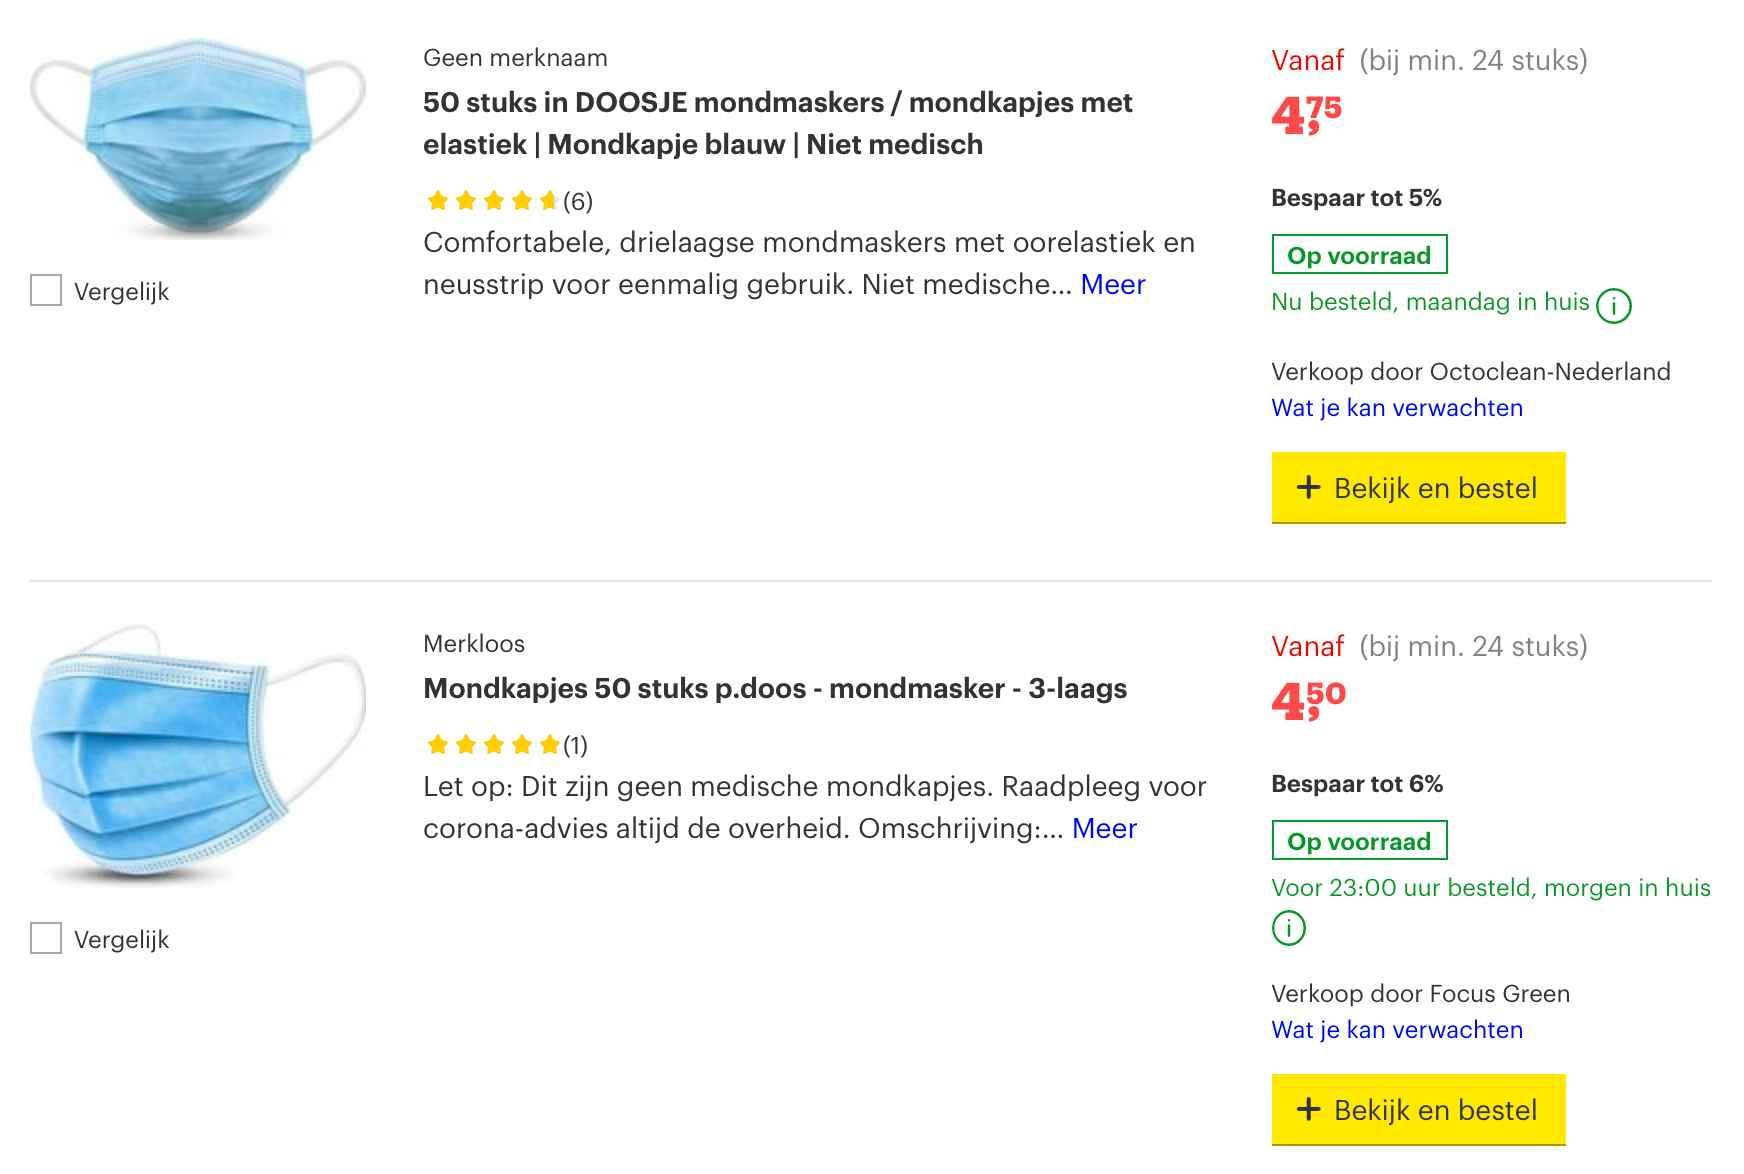 goedkope wegwerp mondkapjes kopen bij bol.com